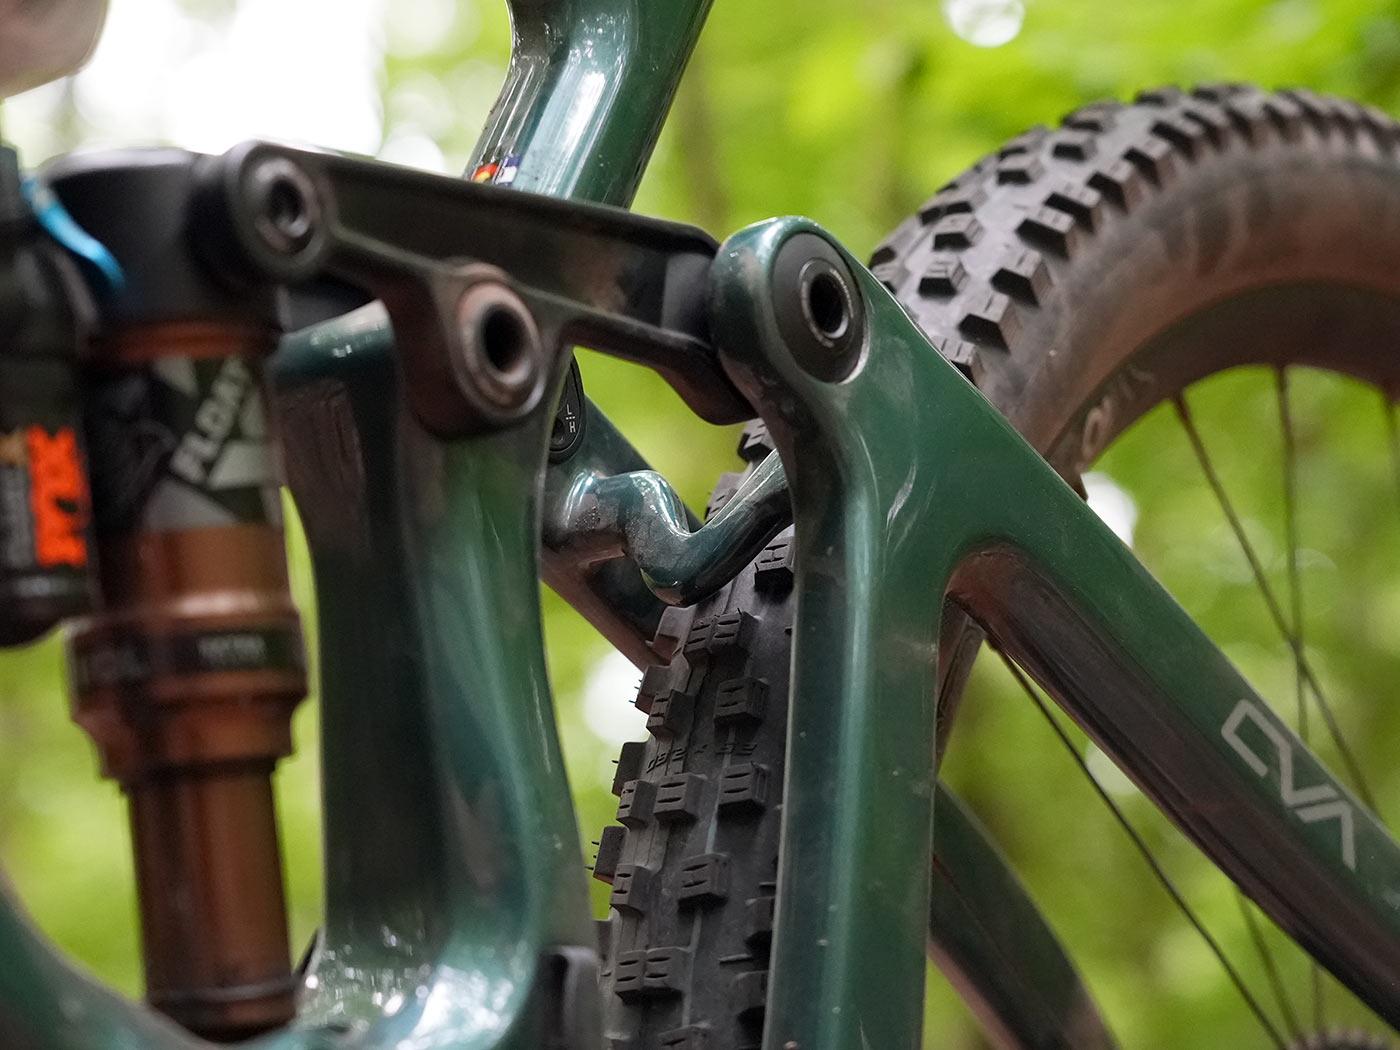 tech details and closeup linkage photos of the 2022 niner jet 9 rdo trail mountain bike